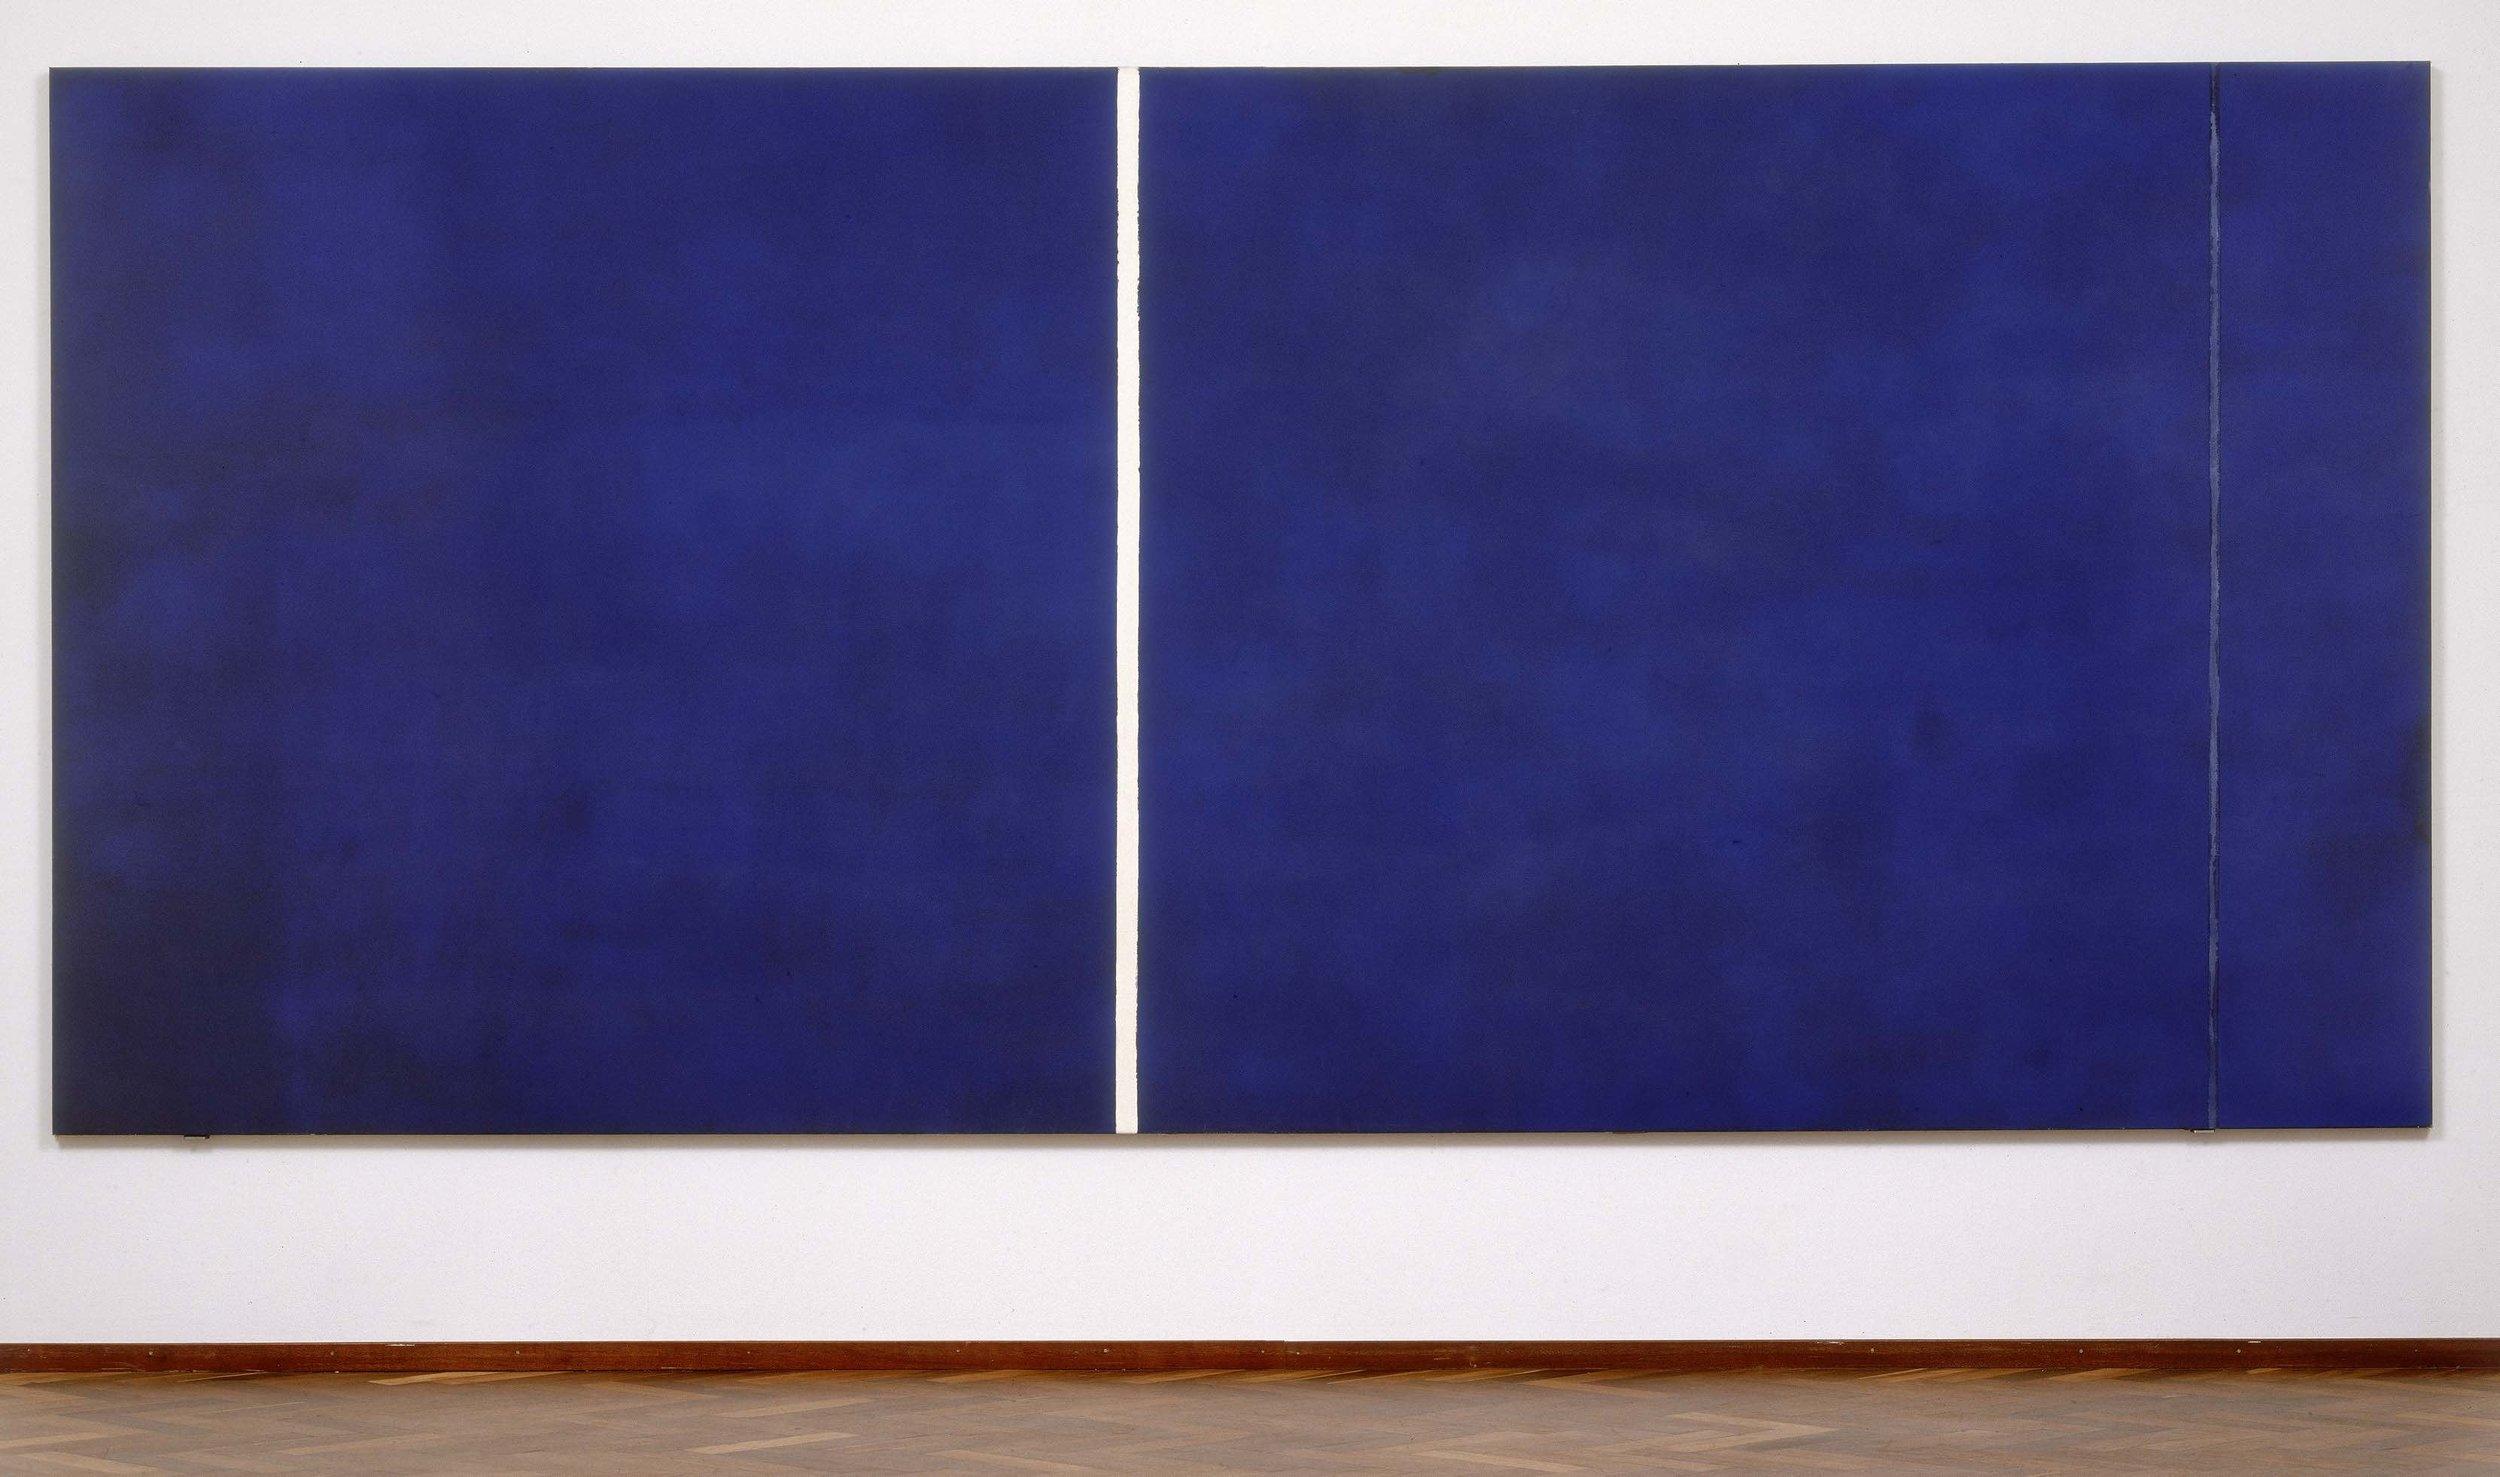 Barnett-Newman-Cathedra-1957.jpg